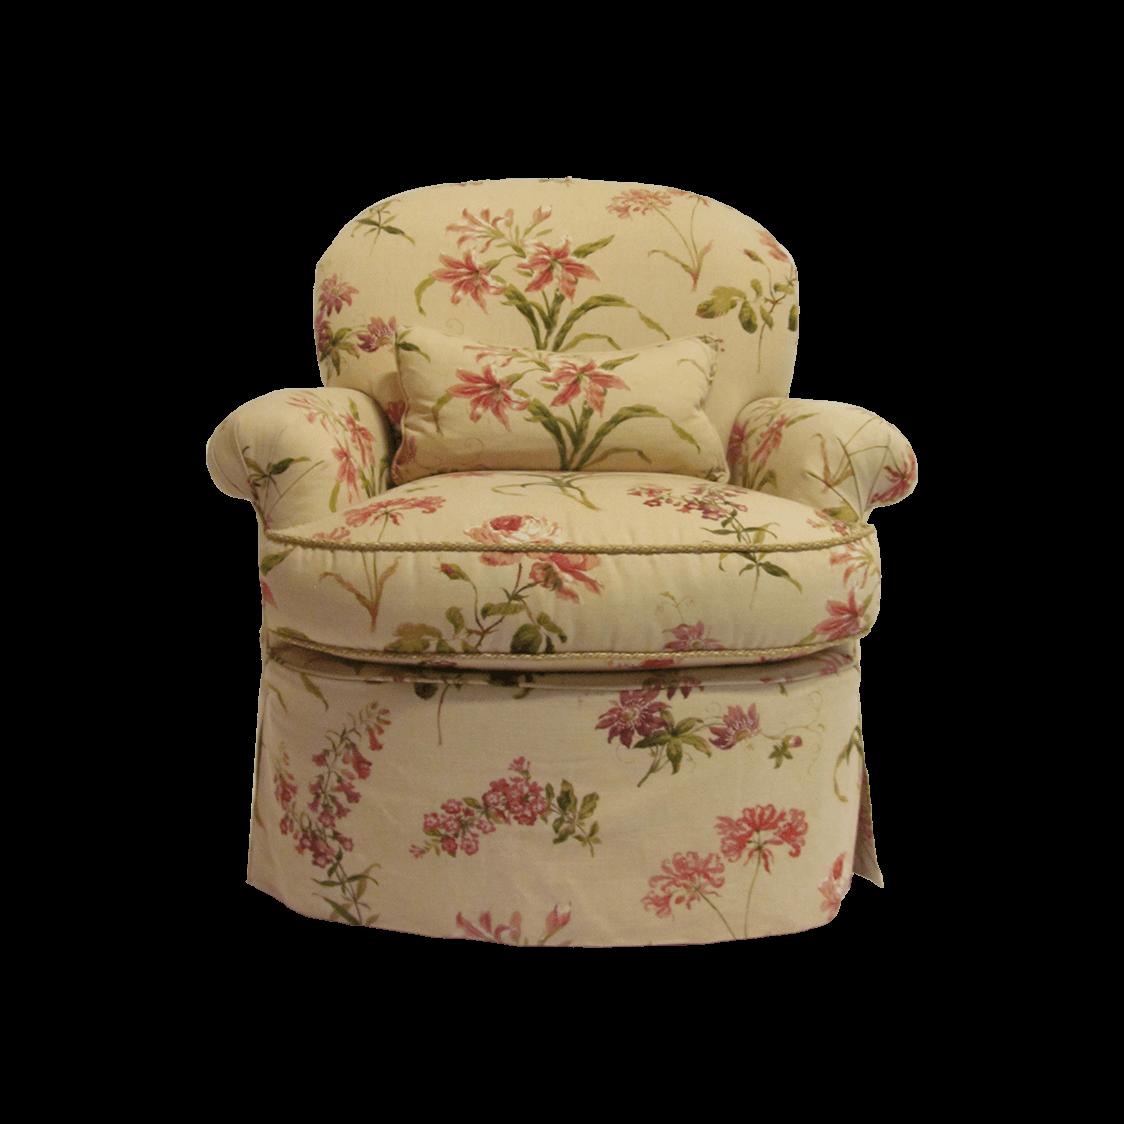 216203_Skirted_Club_Chair